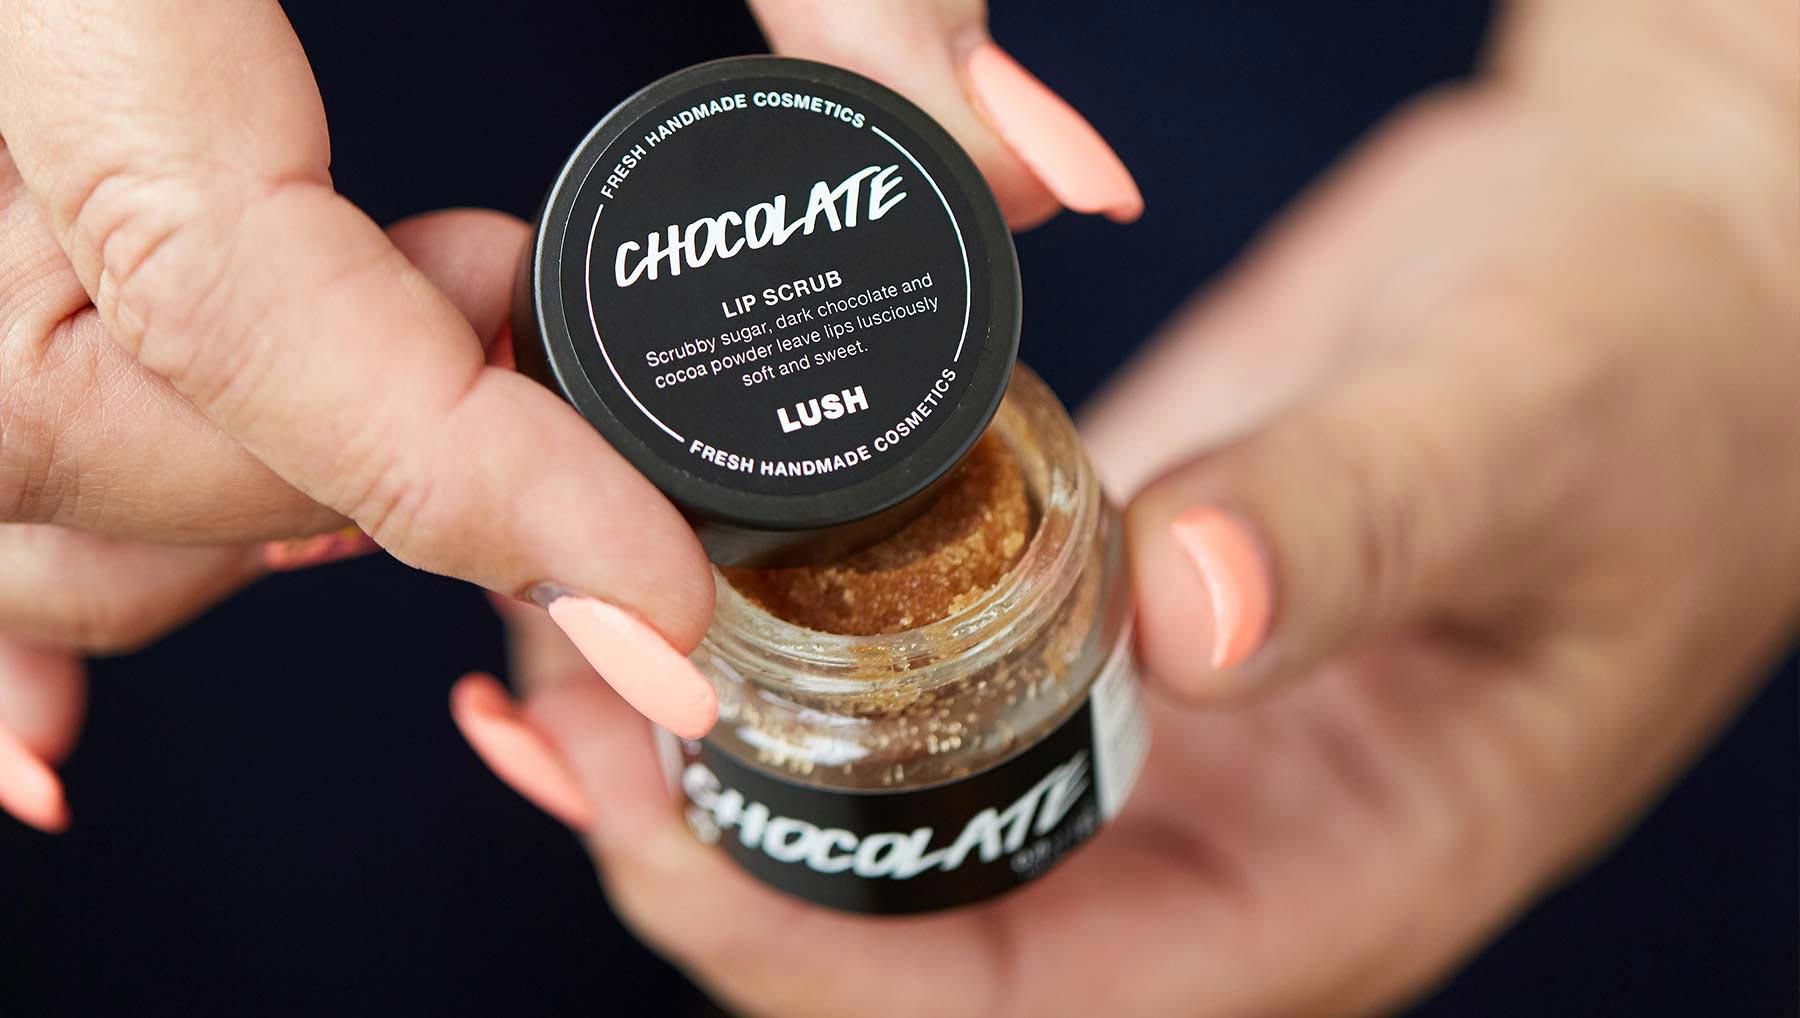 Tẩy Da Chết Môi Lush Chocolate